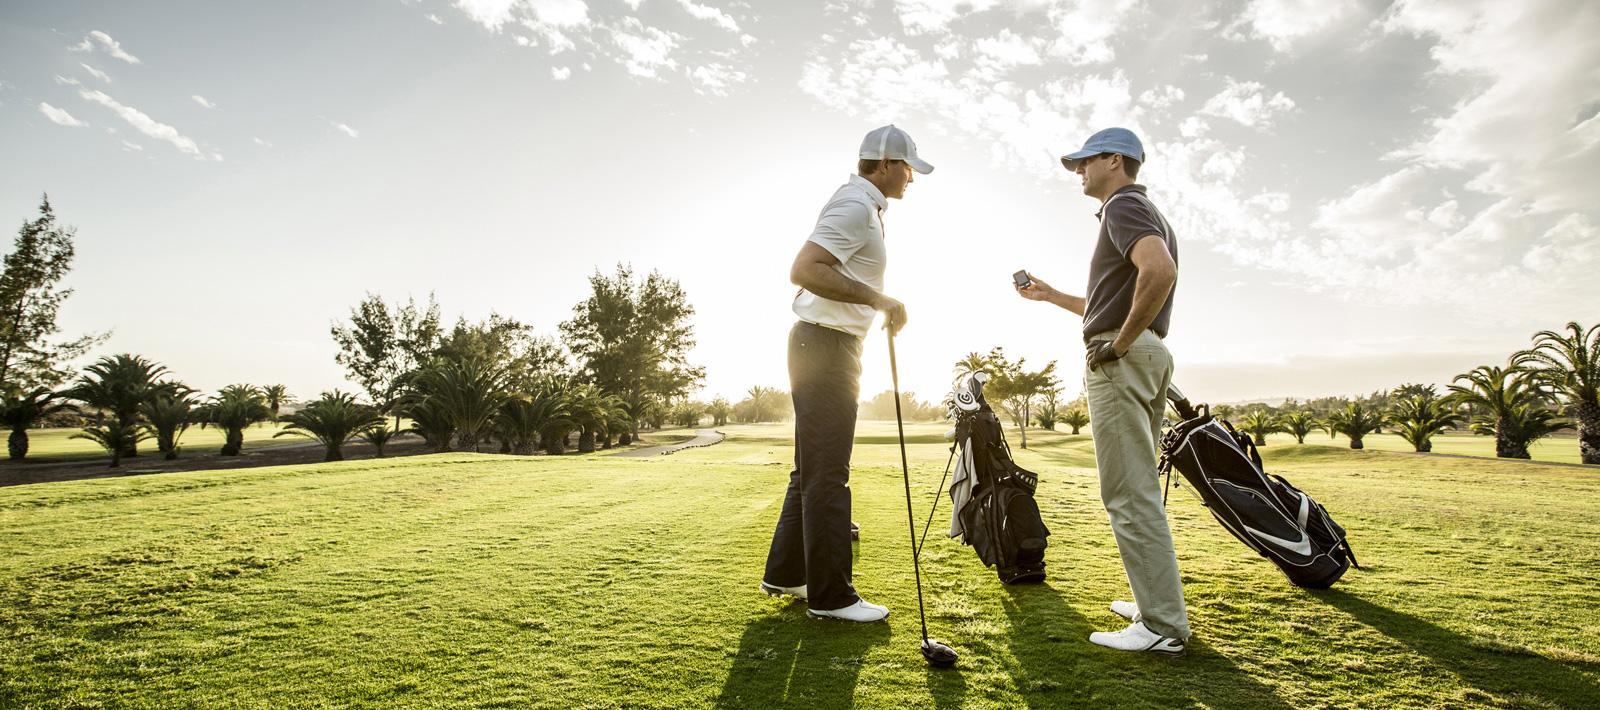 golfbaner norge kart Golf | Garmin golfbaner norge kart